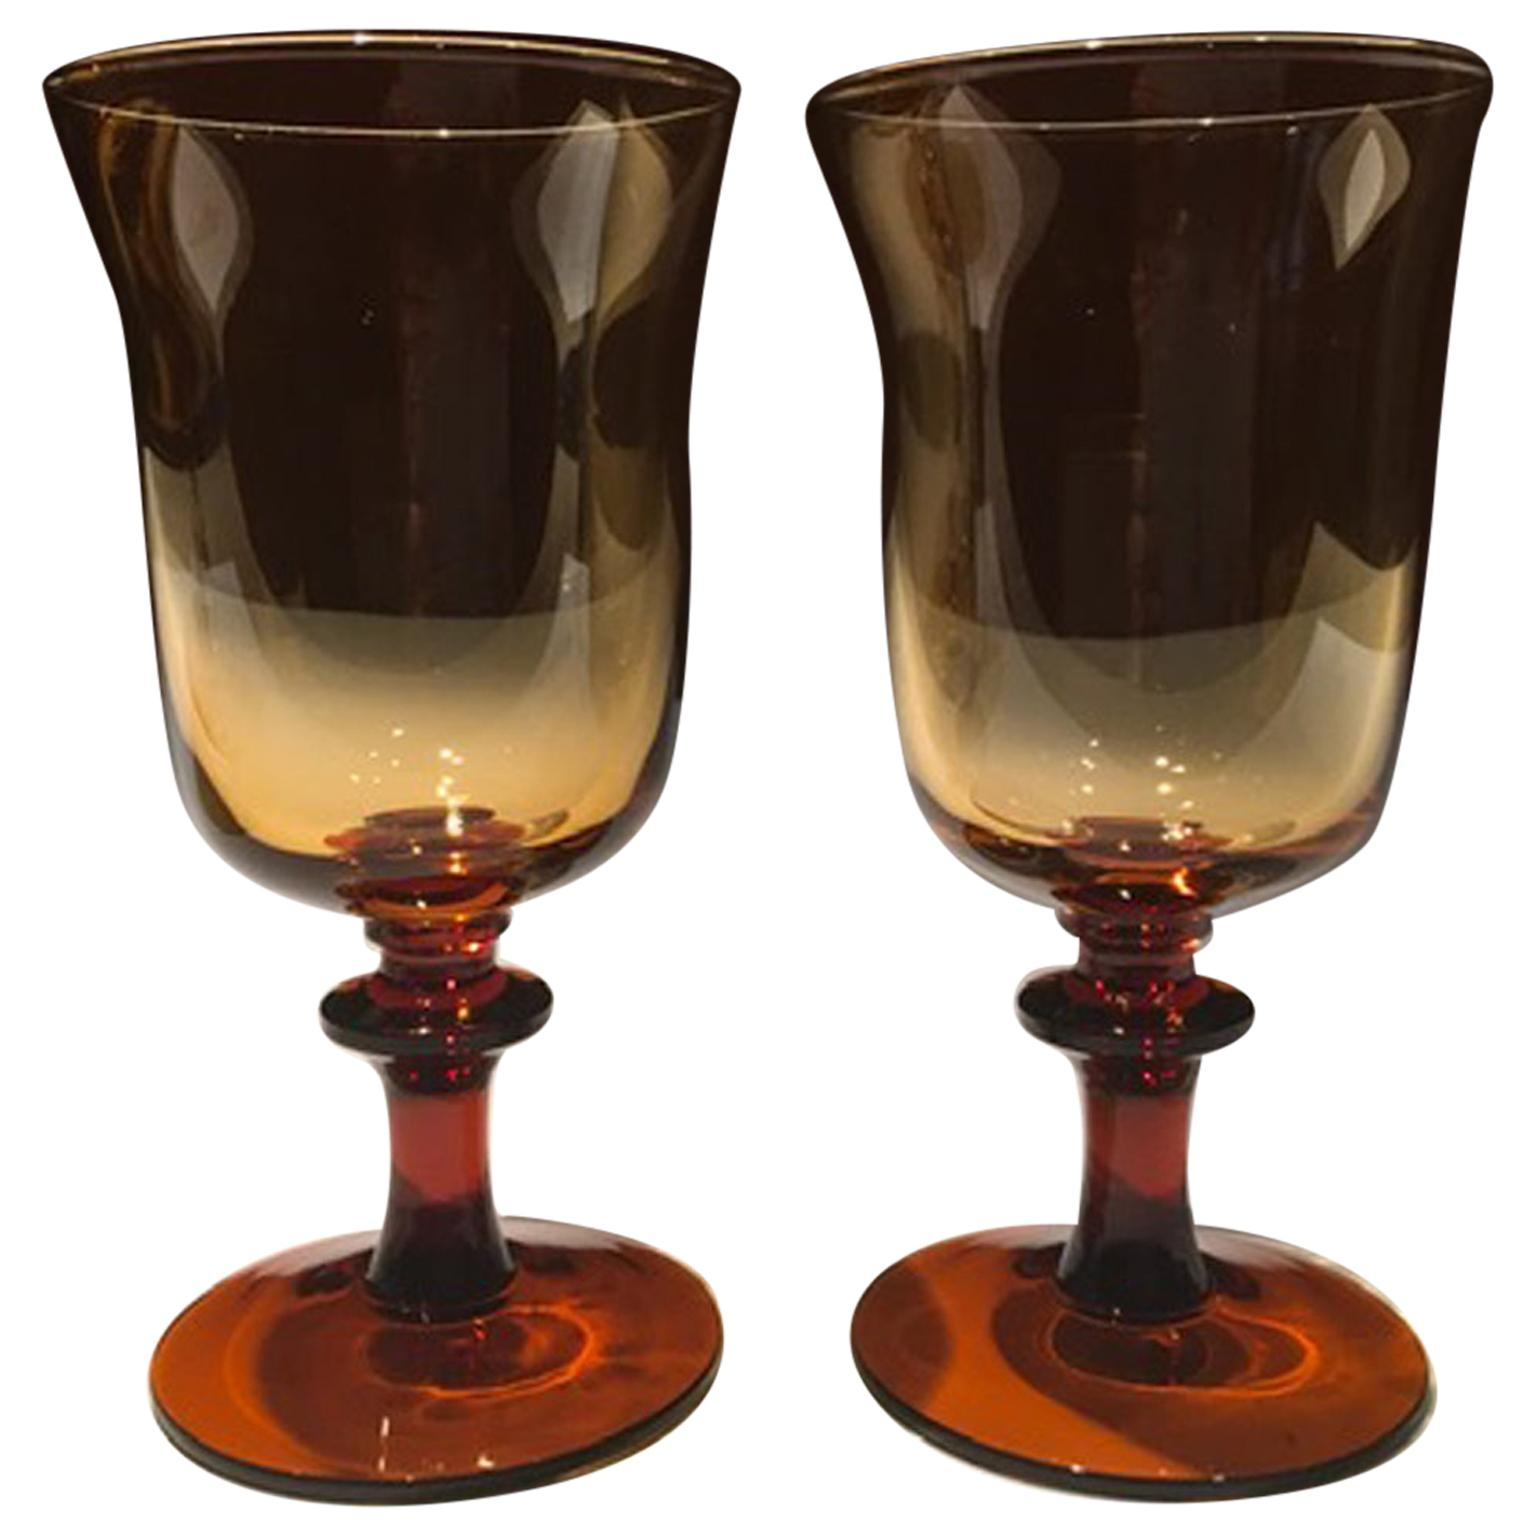 France Pair of Blown Amber Glass Gobelets or Little Vases